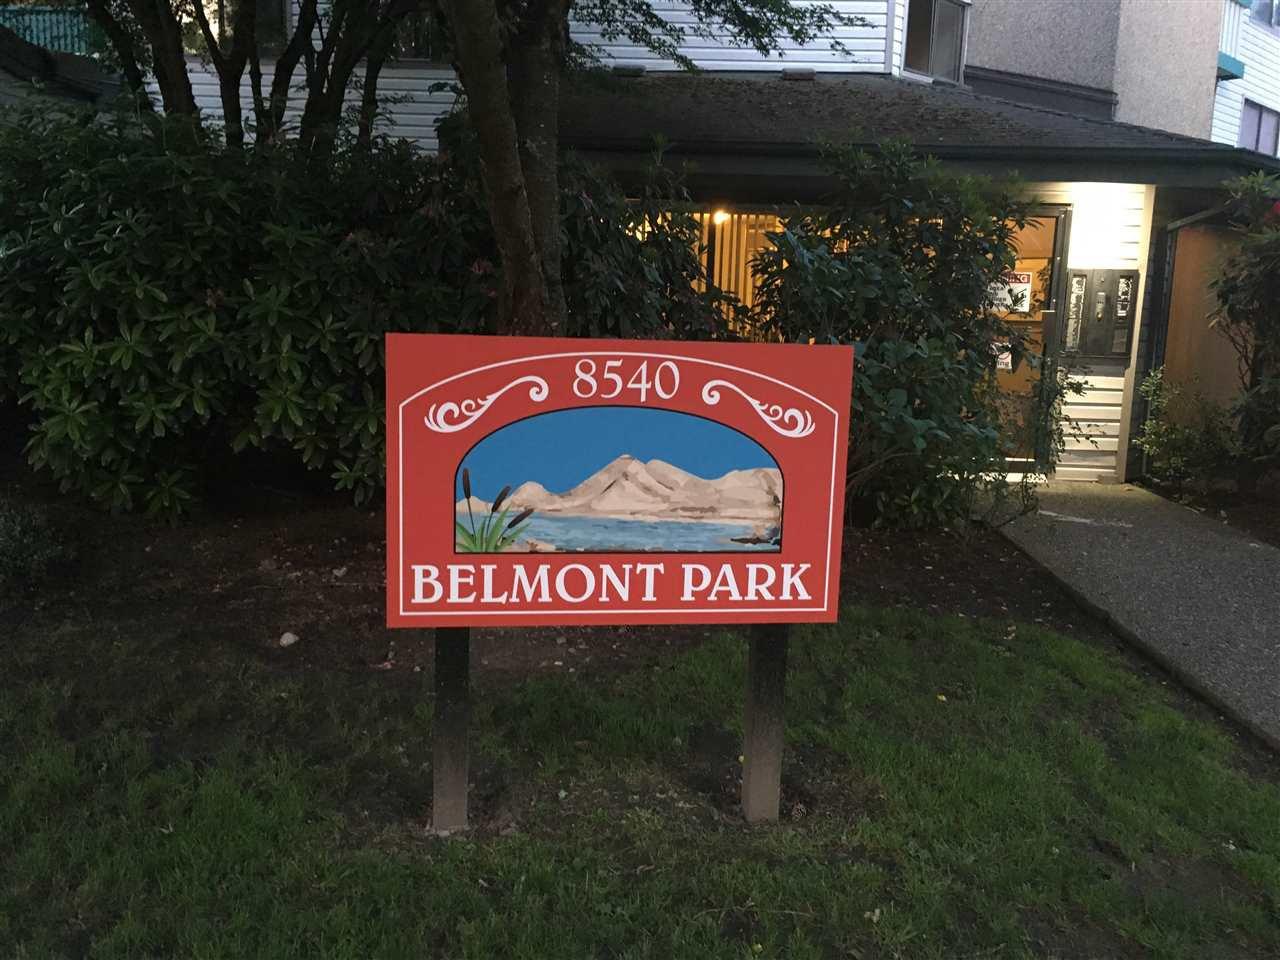 Main Photo: 315 8540 CITATION Drive in Richmond: Brighouse Condo for sale : MLS®# R2377231